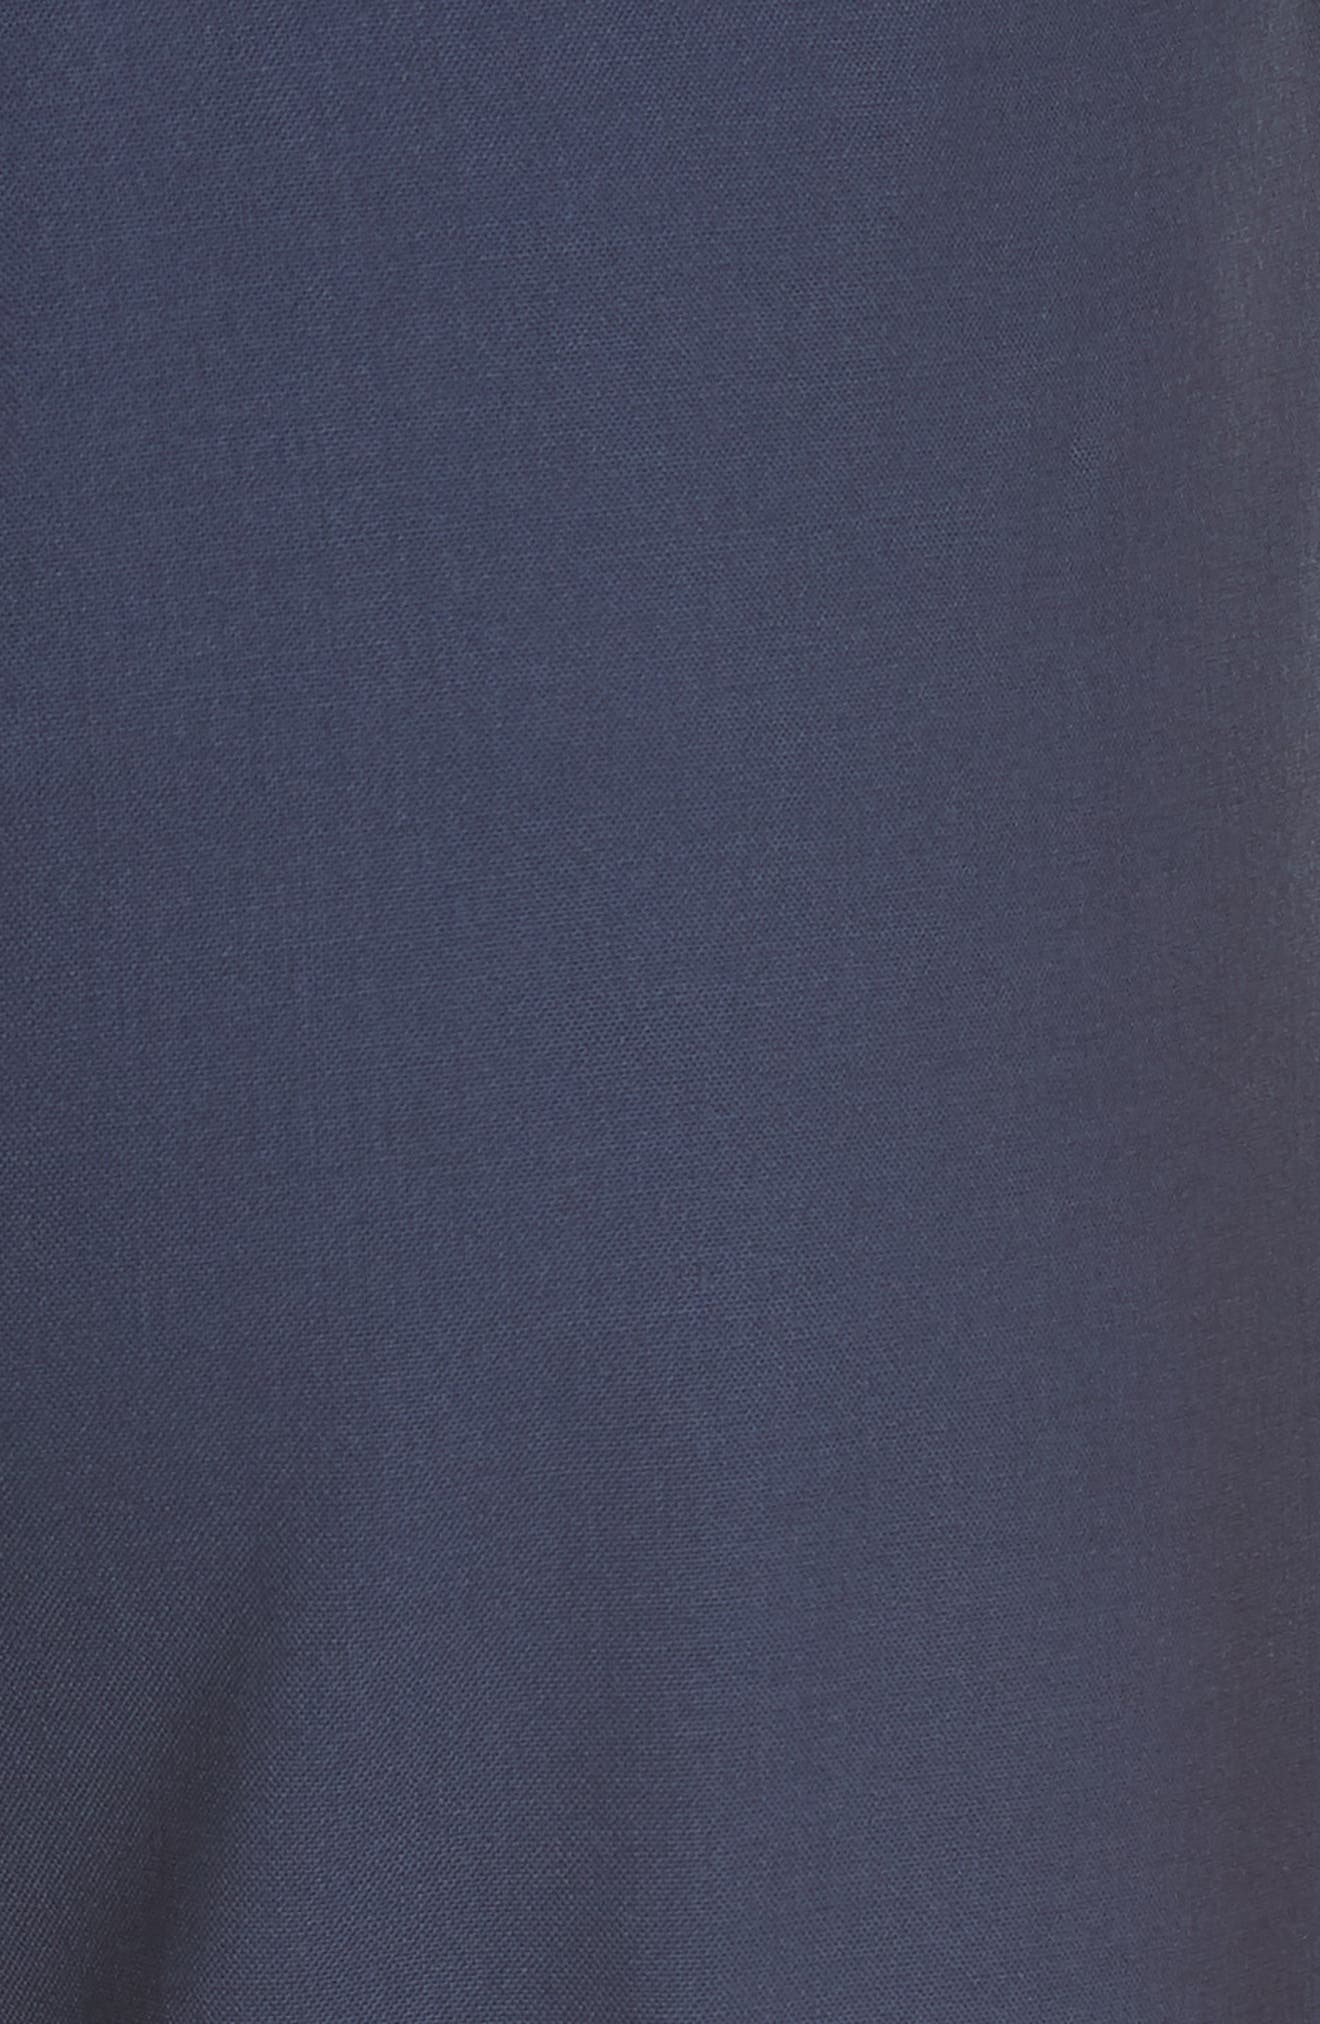 Demitria 2 Stretch Wool Suit Pants,                             Alternate thumbnail 19, color,